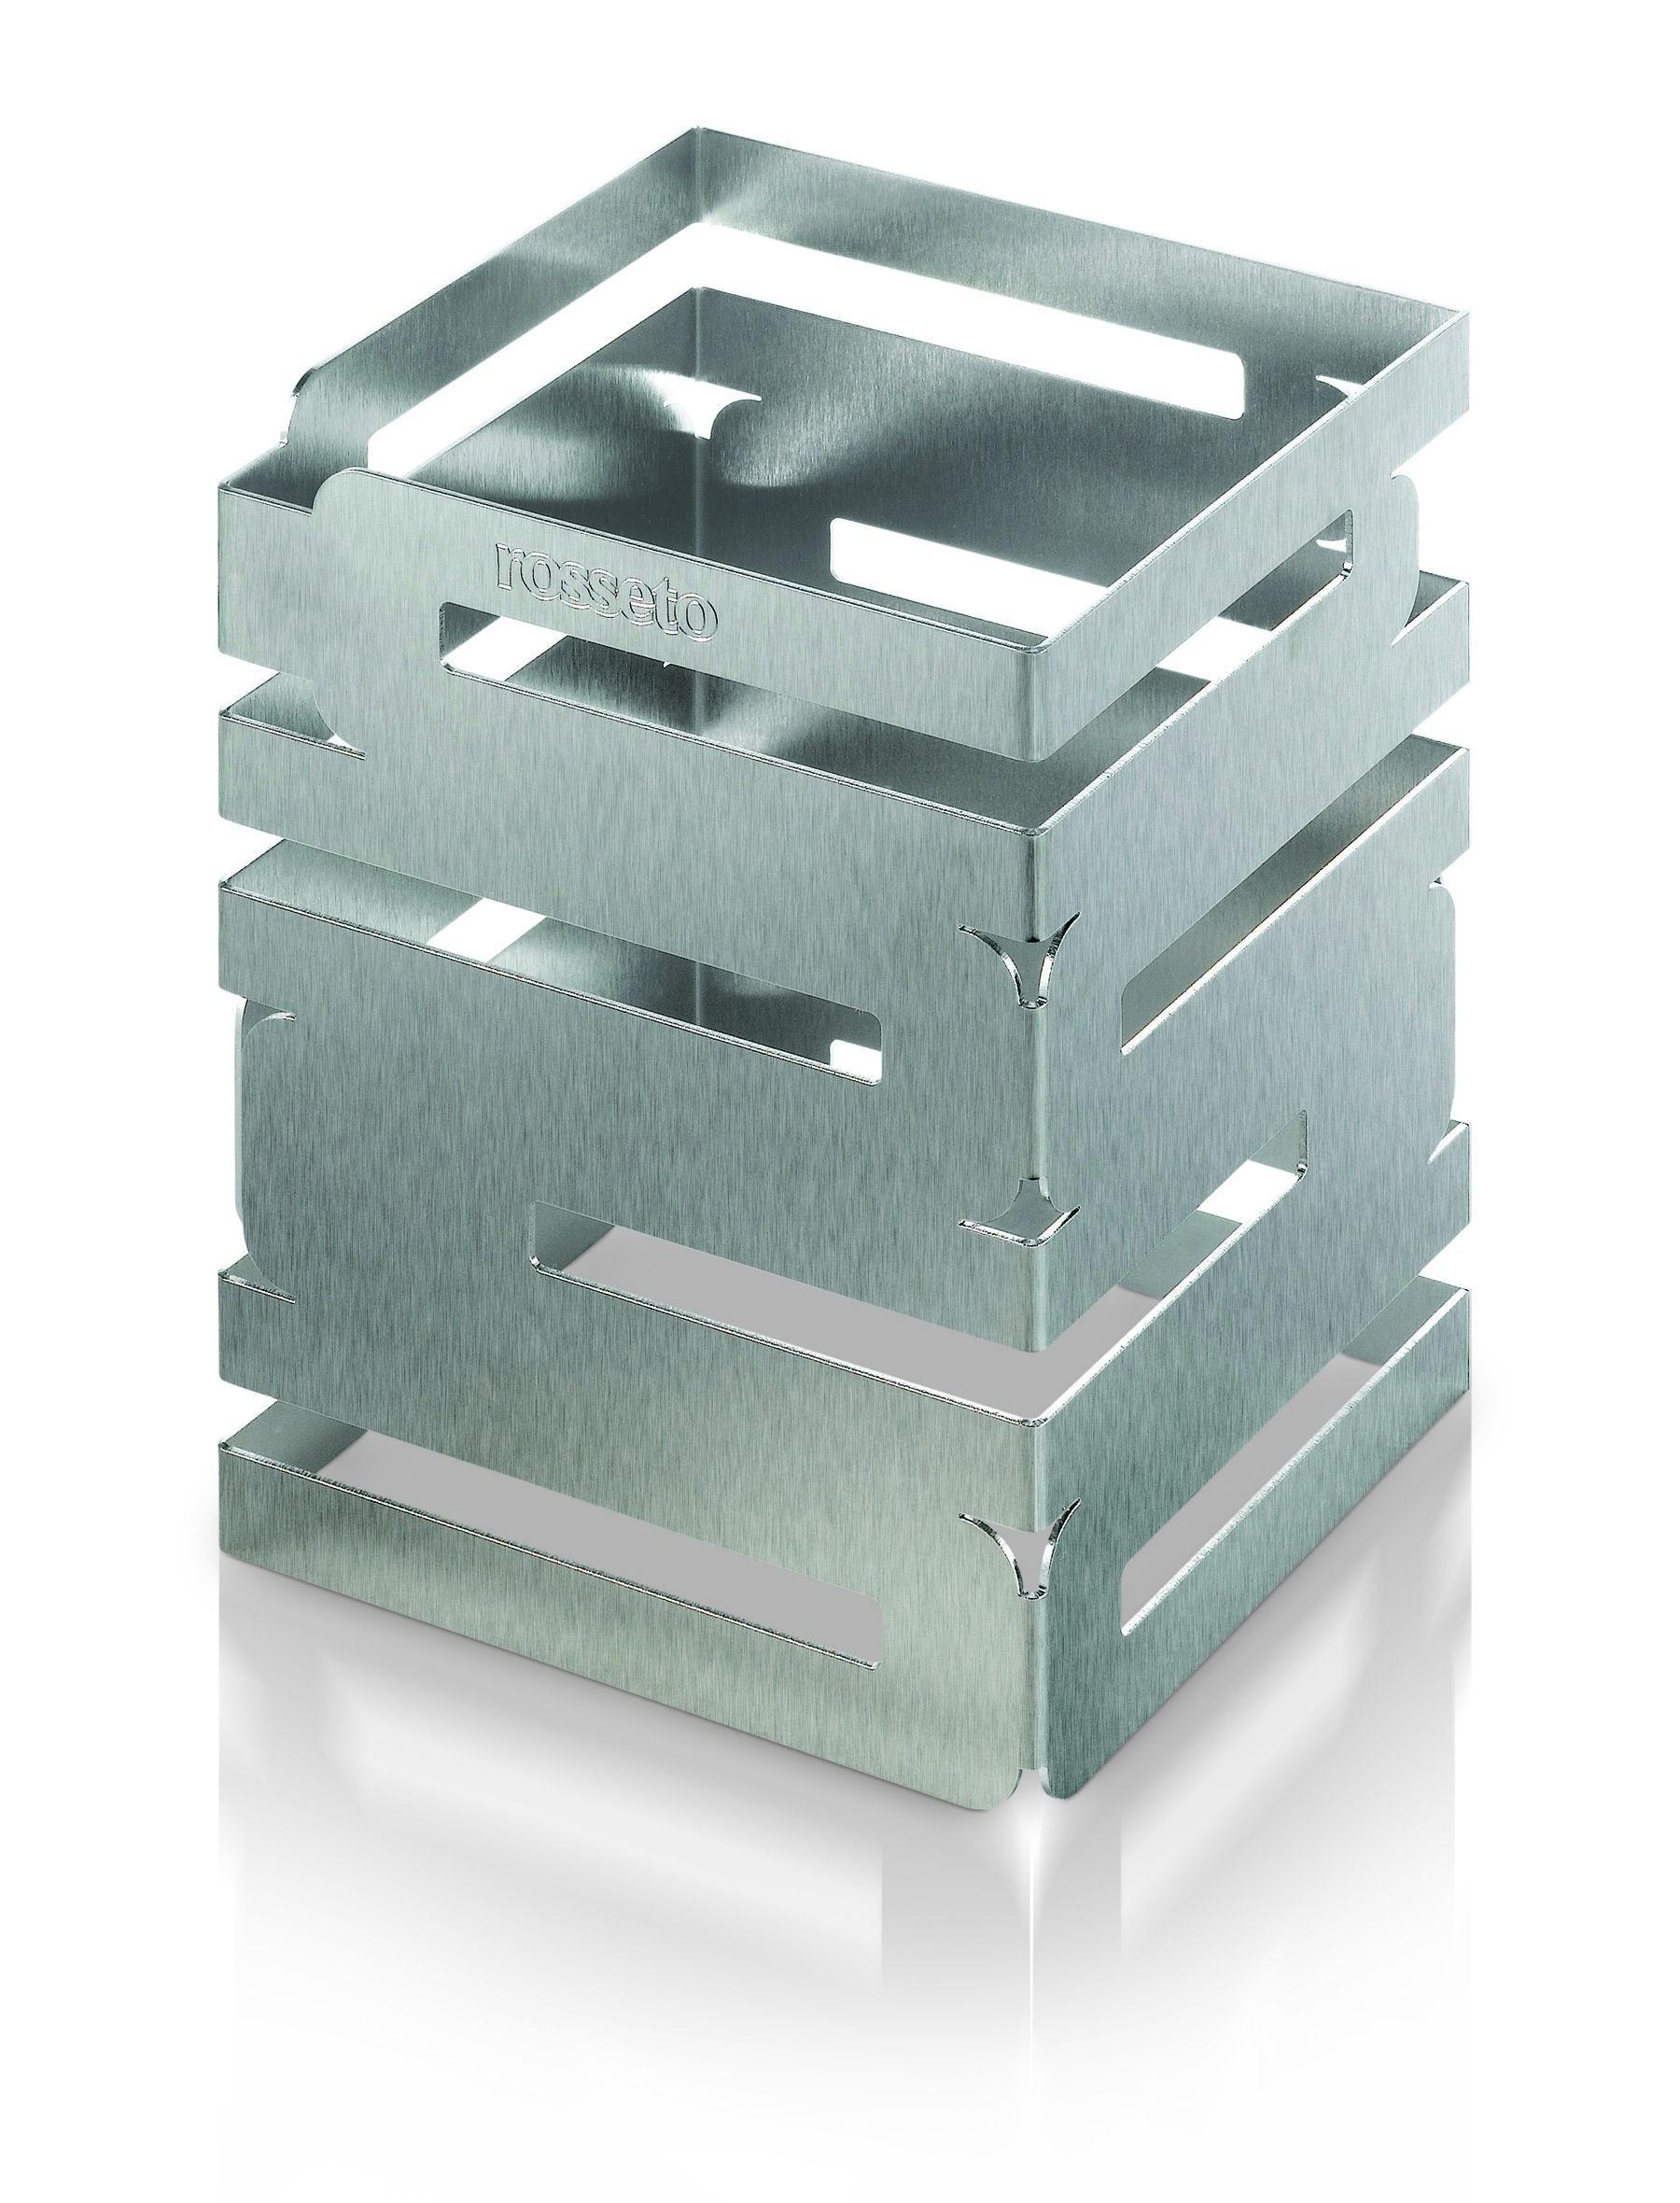 "Rosseto D62377 Skycap Stainless Steel Brushed Finish Square Multi-Level Riser 6"" x 6"" x 8""H"